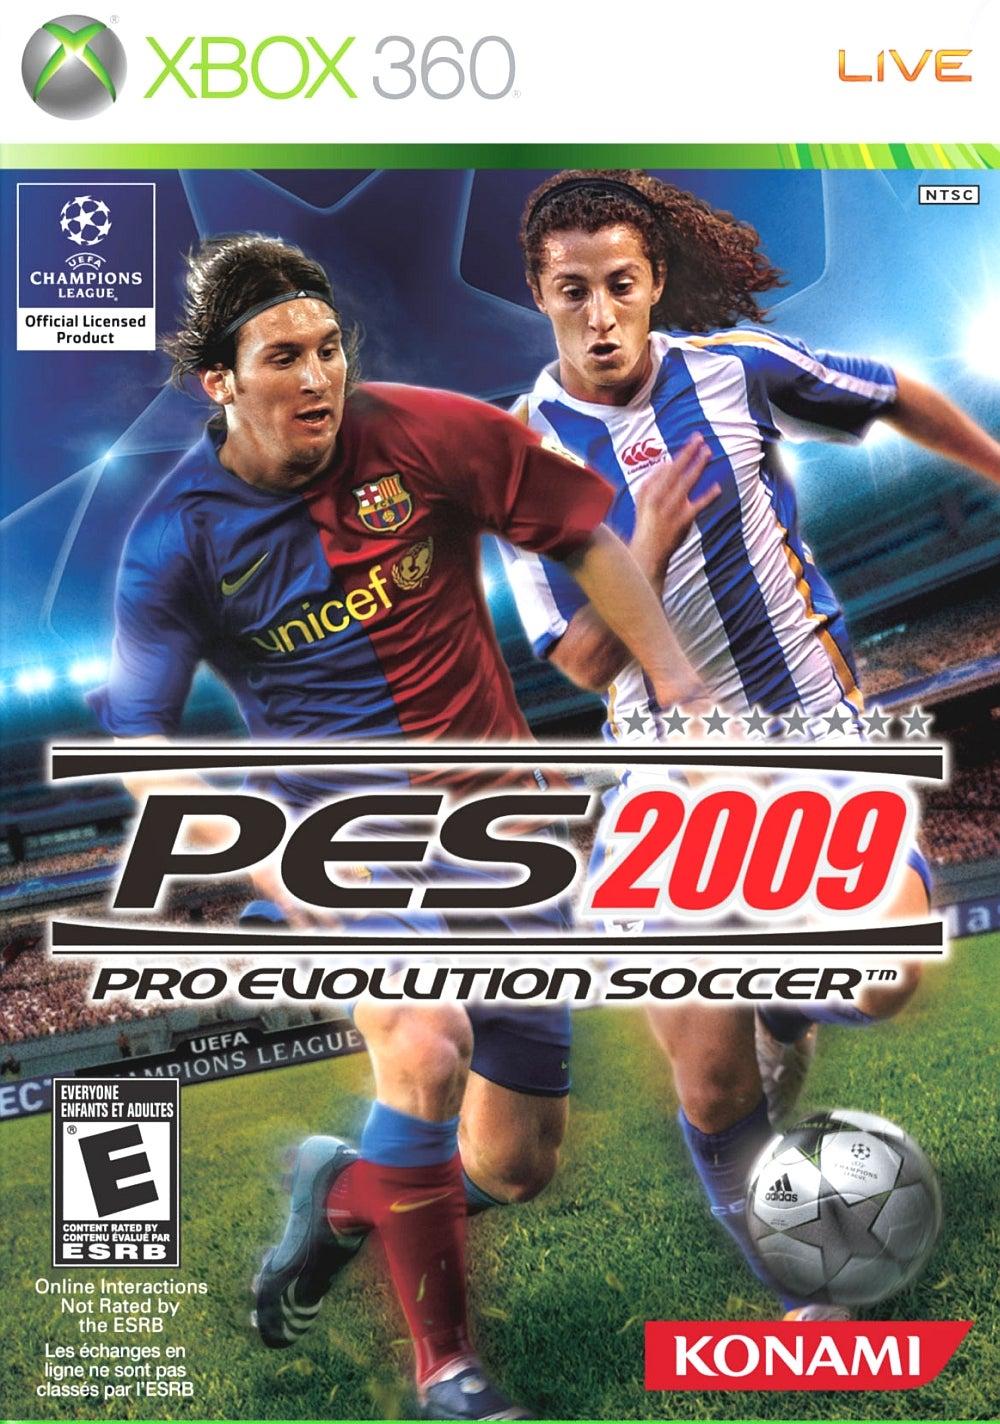 Pro Evolution Soccer 2009 - Xbox 360 - IGN